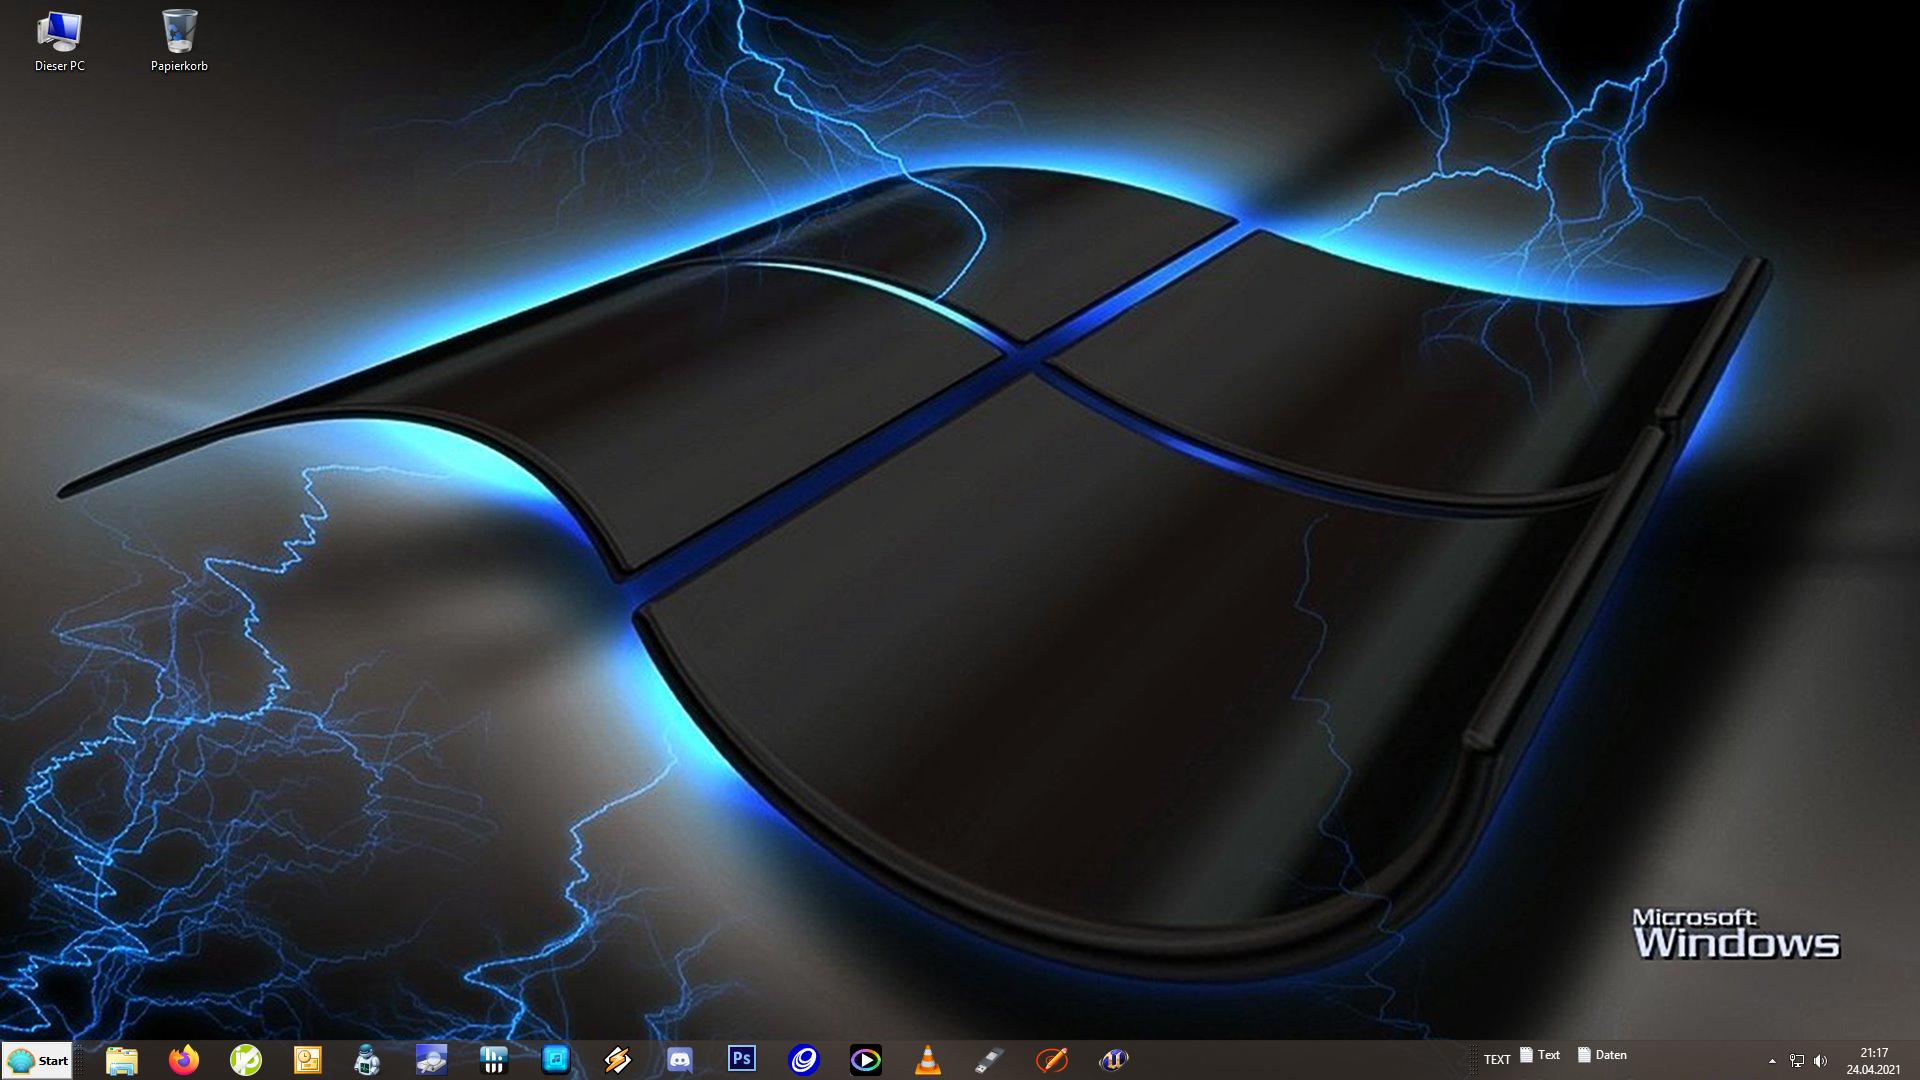 Desktop Windows 8.1 Microsoft.jpg